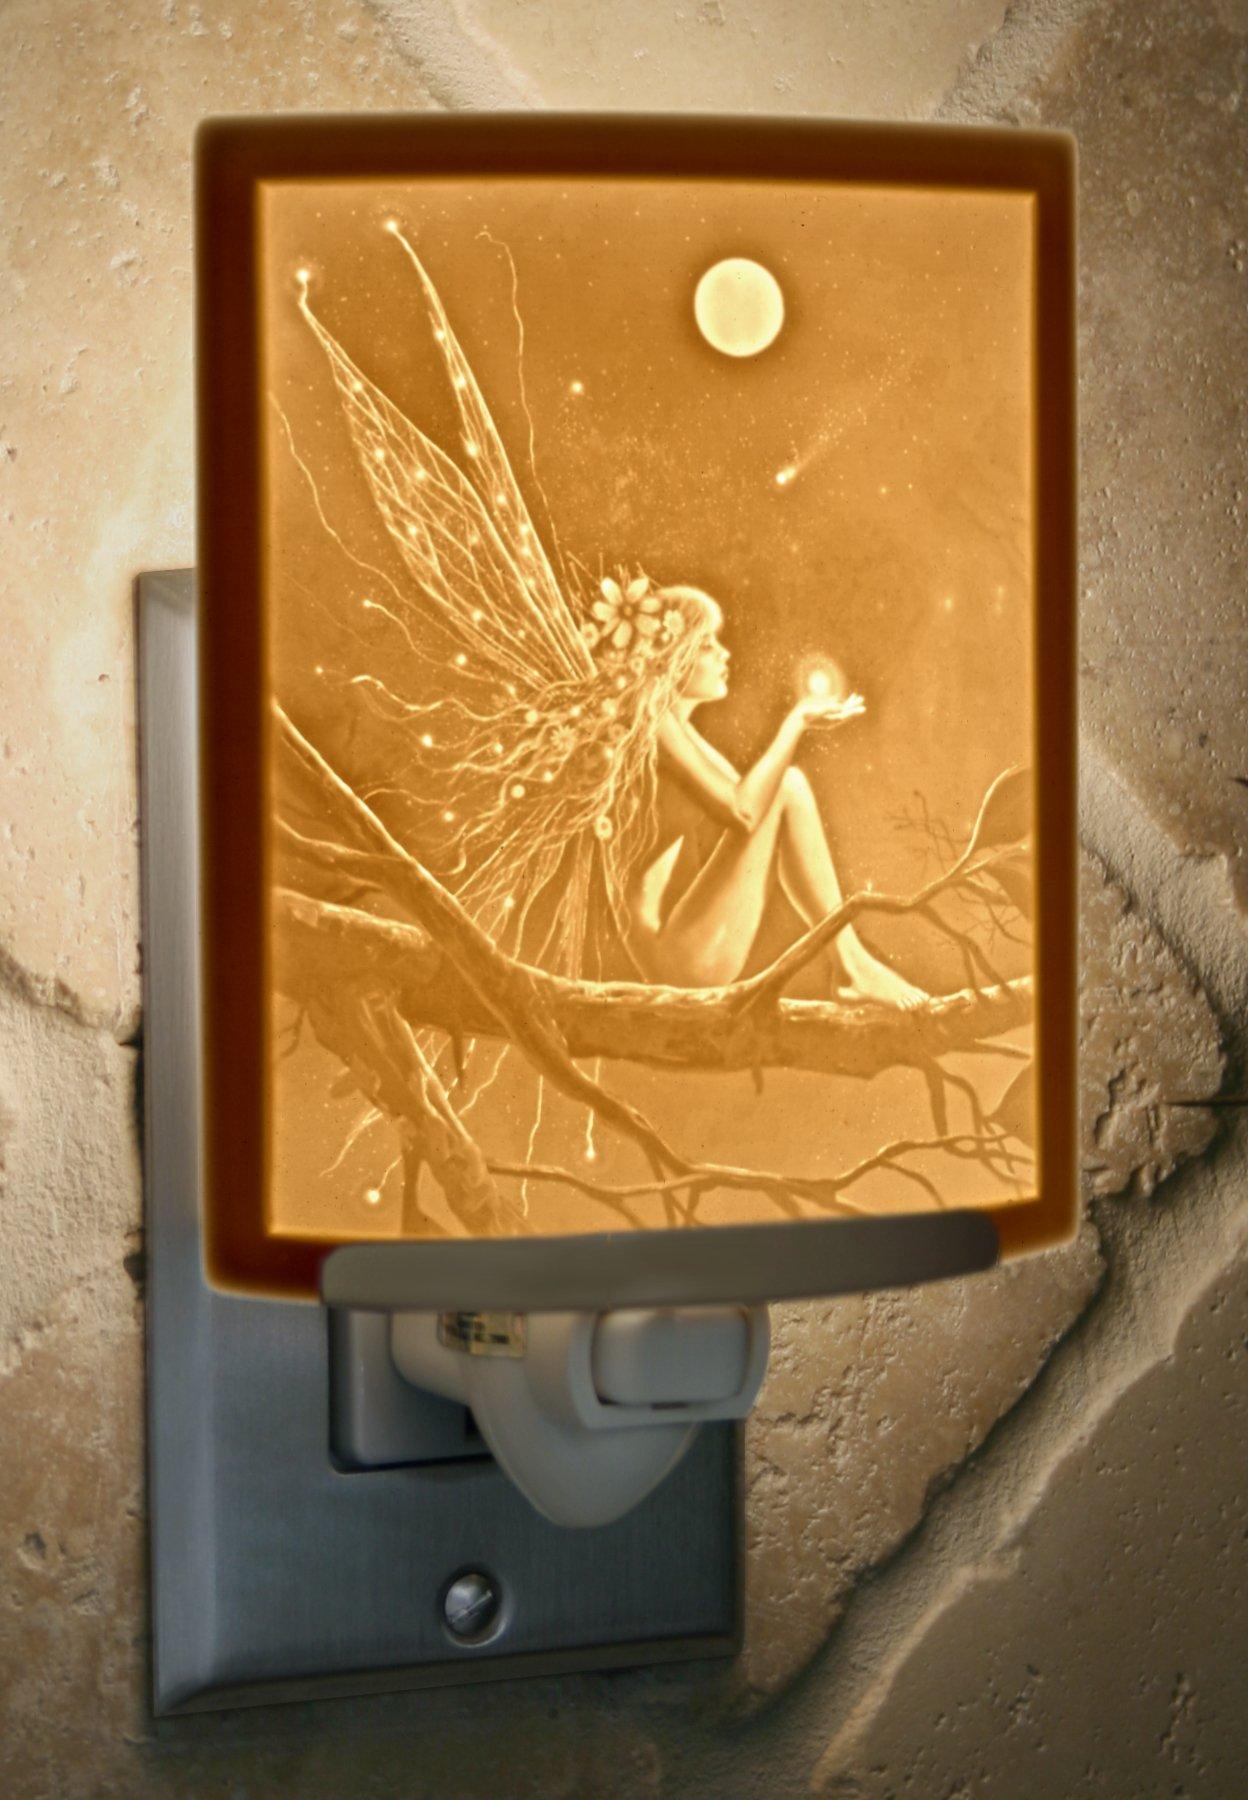 Catch a Falling Star by David Delamare Porcelain Lithophane Night Light by The Porcelain Garden (Image #2)